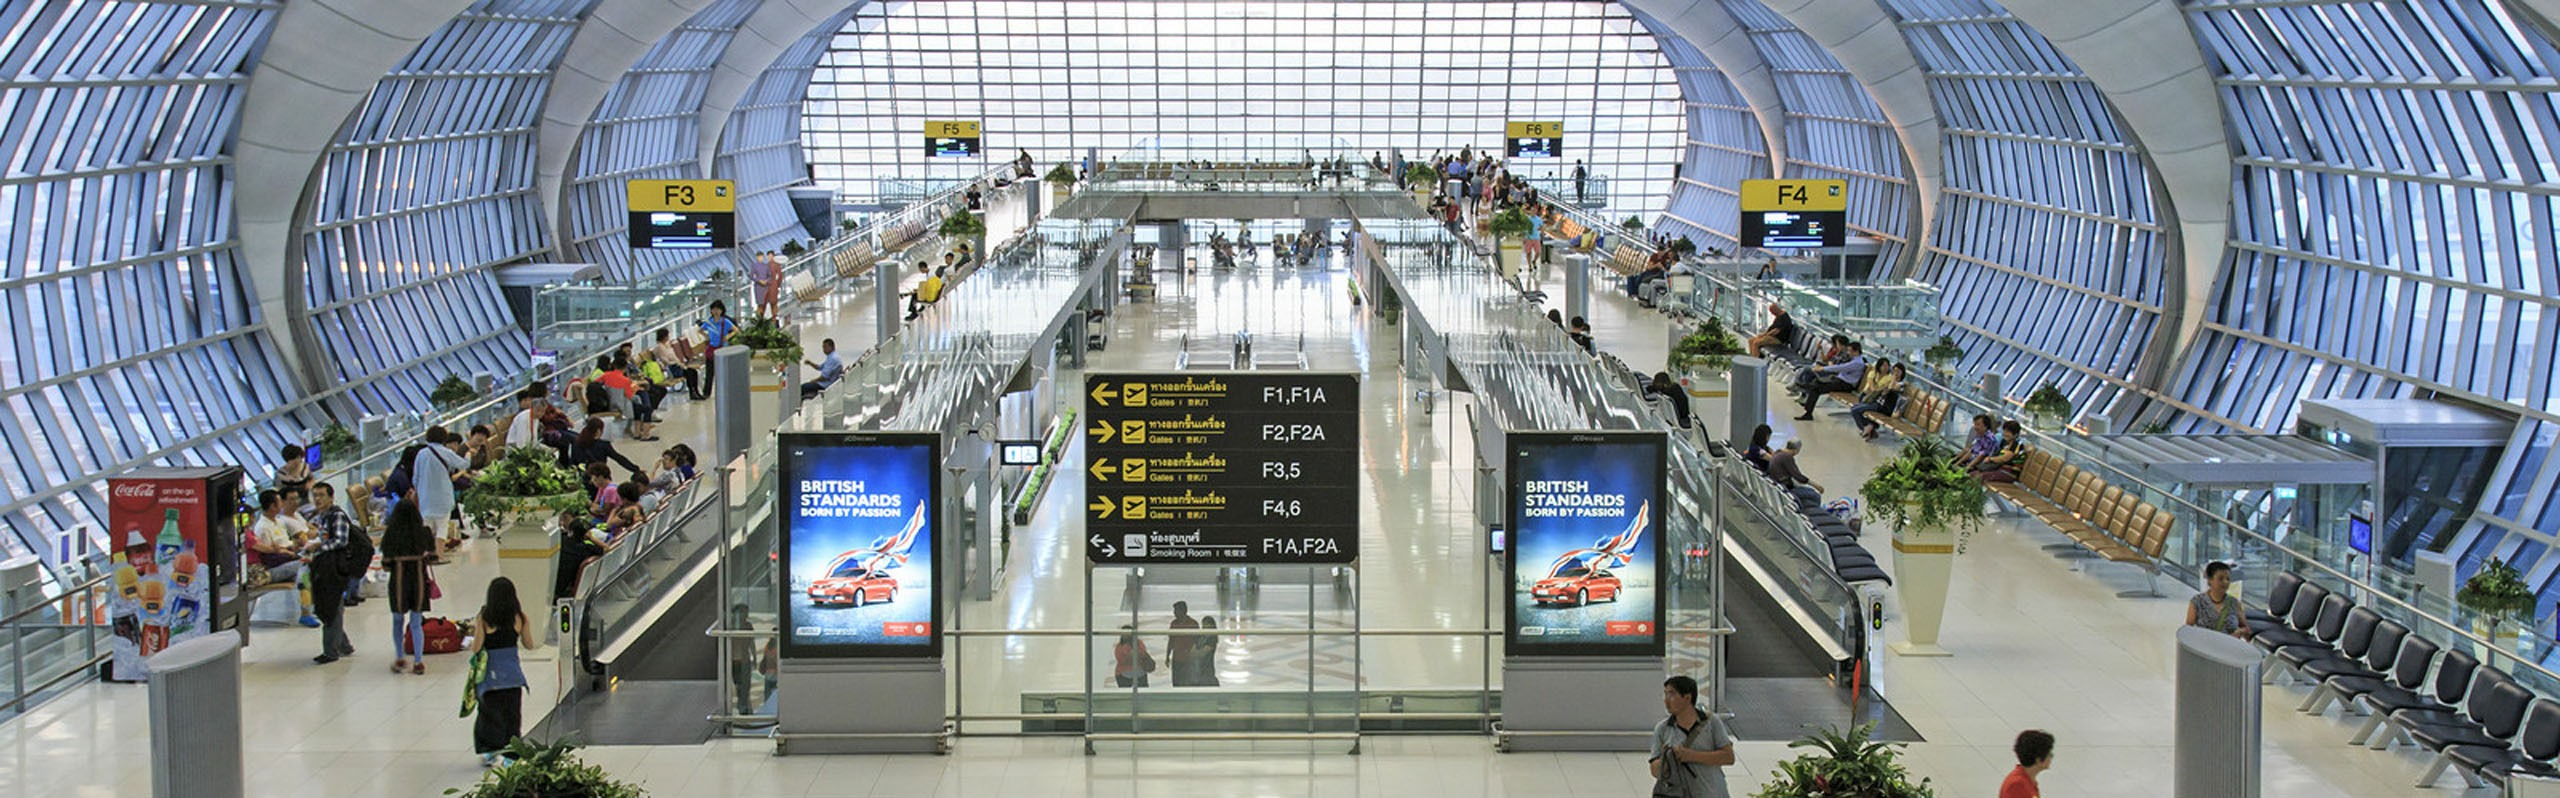 How to Get to Bangkok